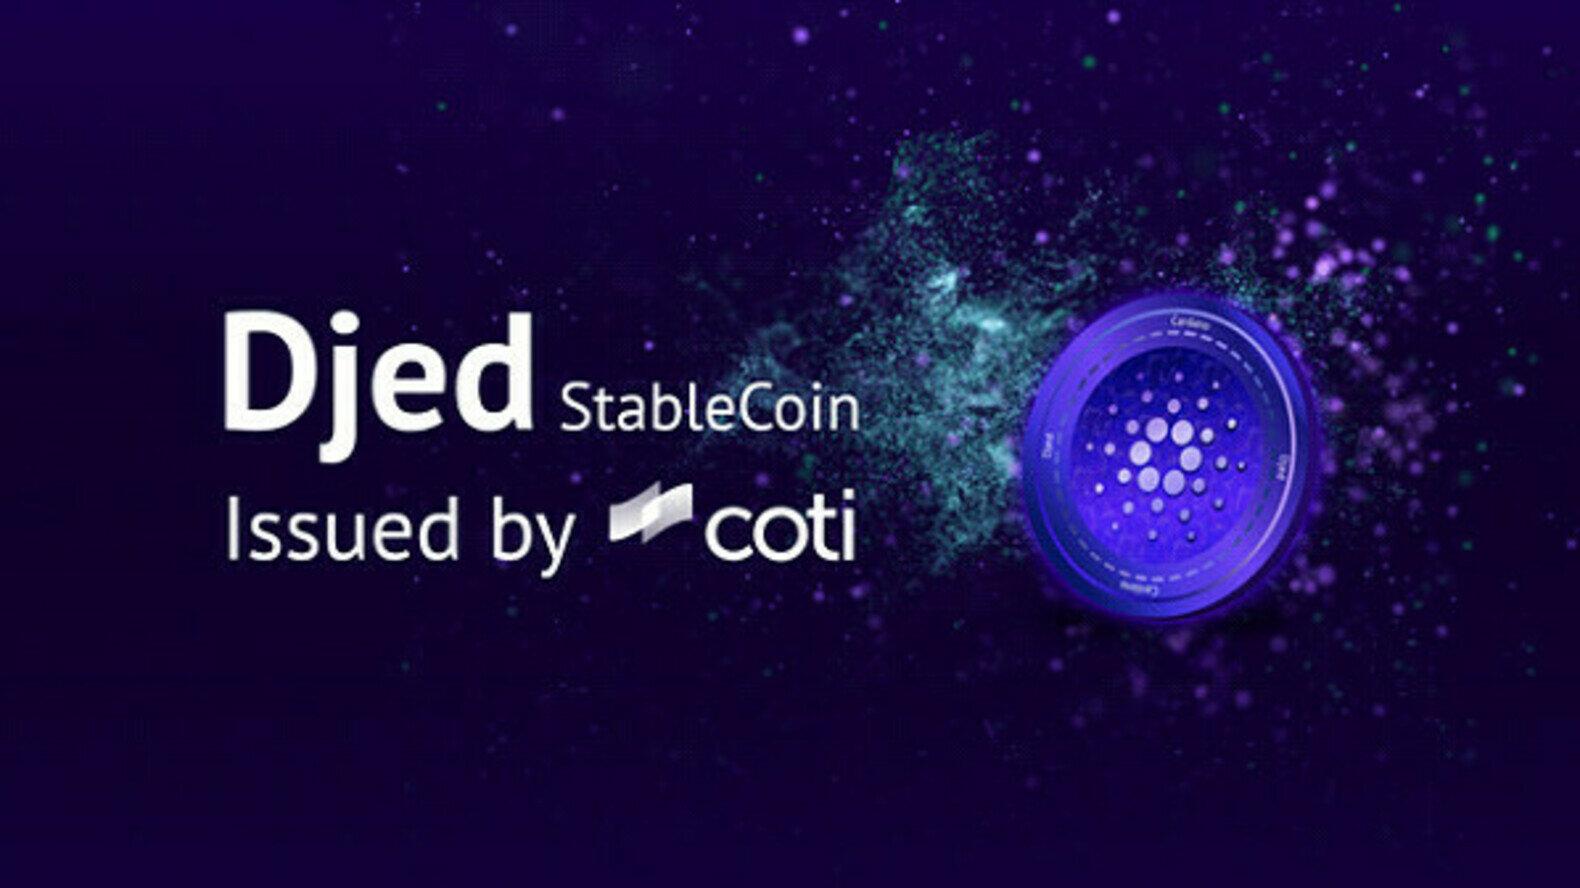 "COTI 将在 Casdfsrdasdfsno 上发行首个算法稳定币"""